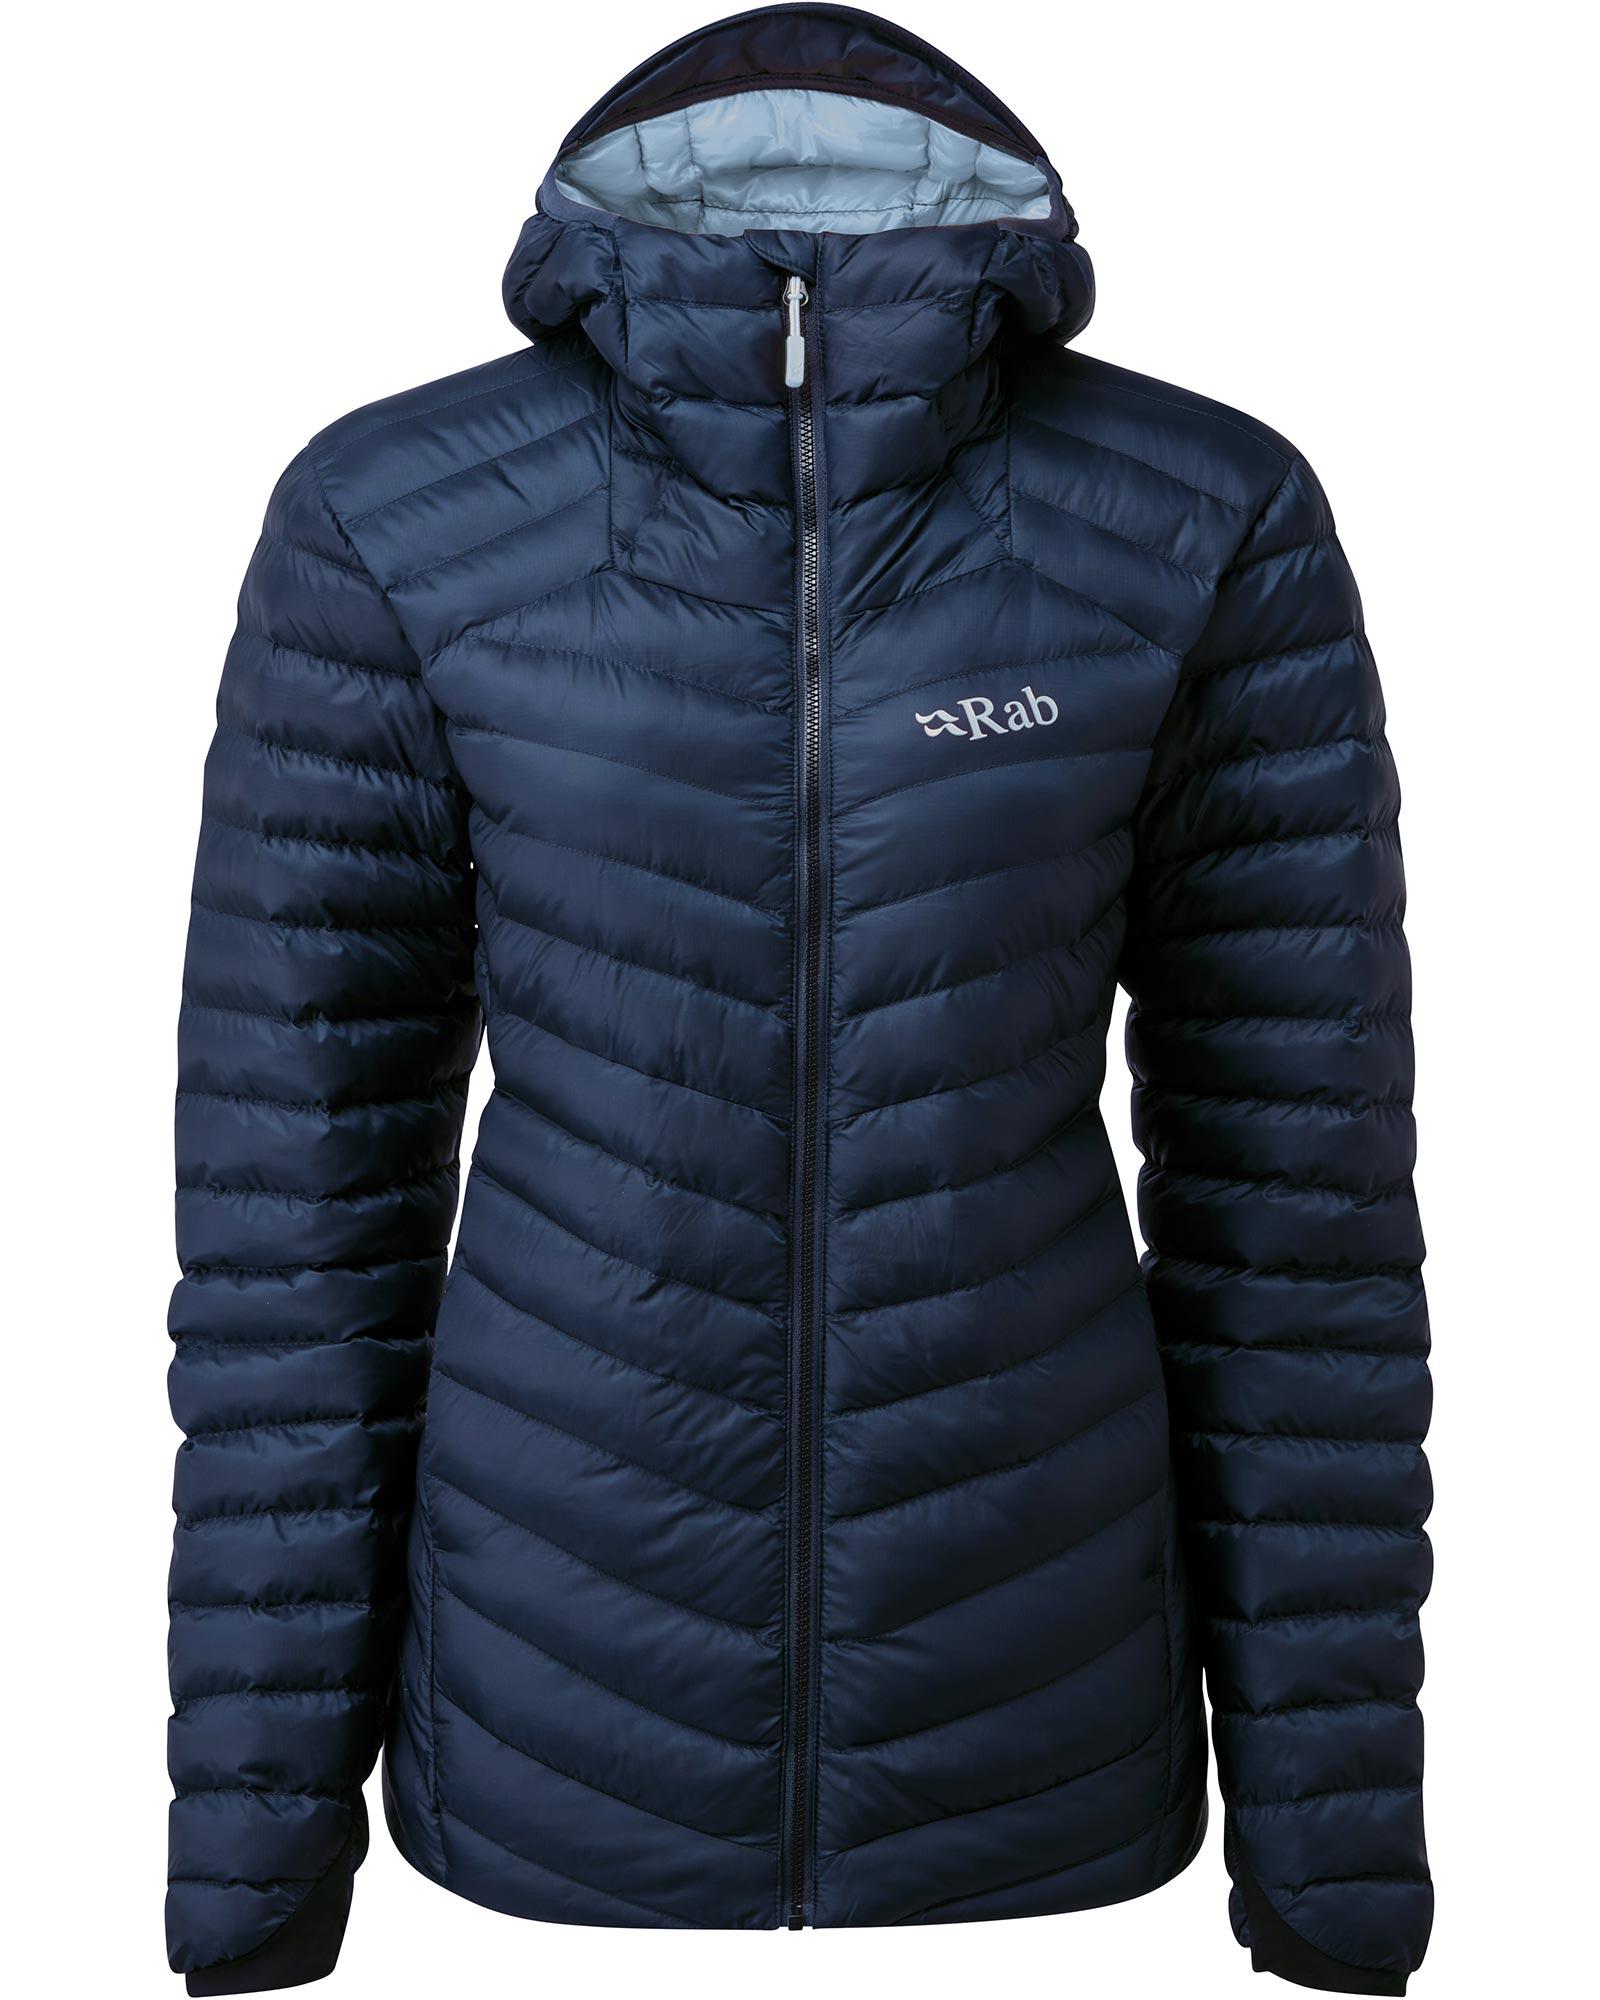 Rab Women's Cirrus Alpine Jacket 0